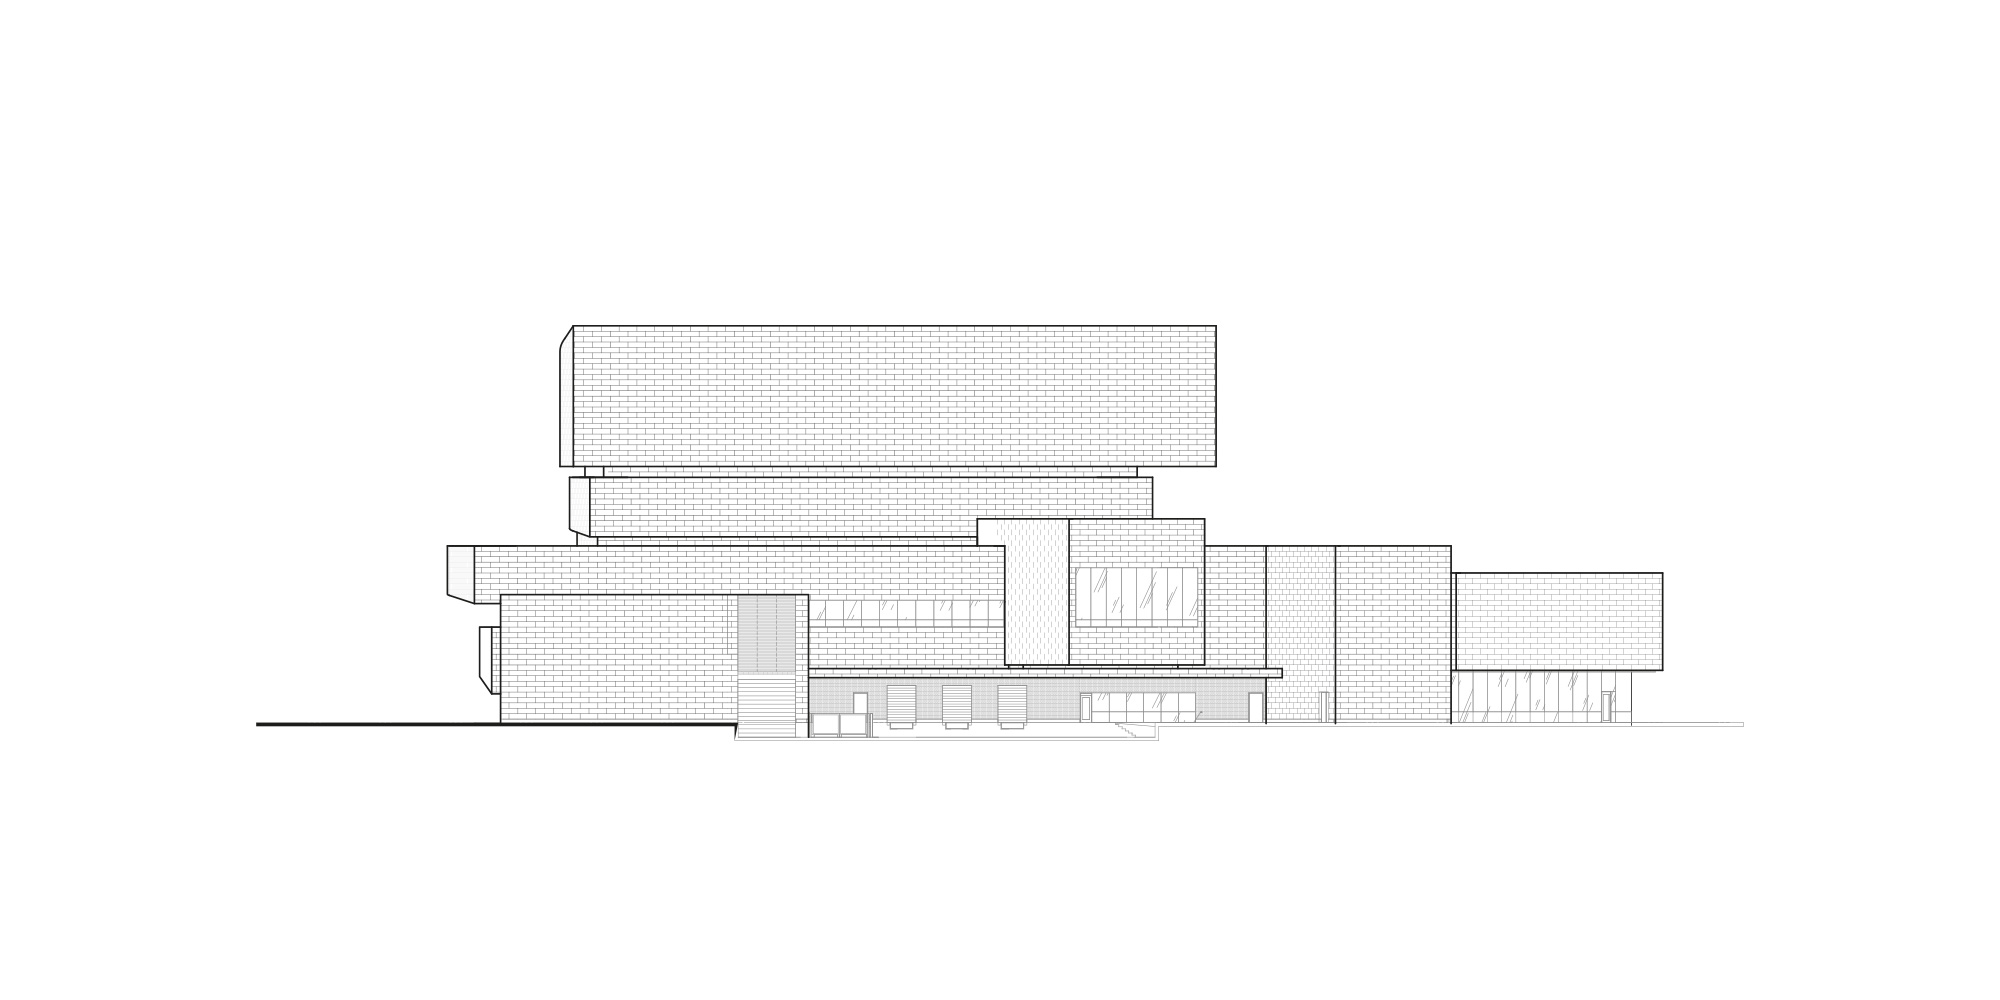 North elevation © Pelli Clarke Pelli Architects